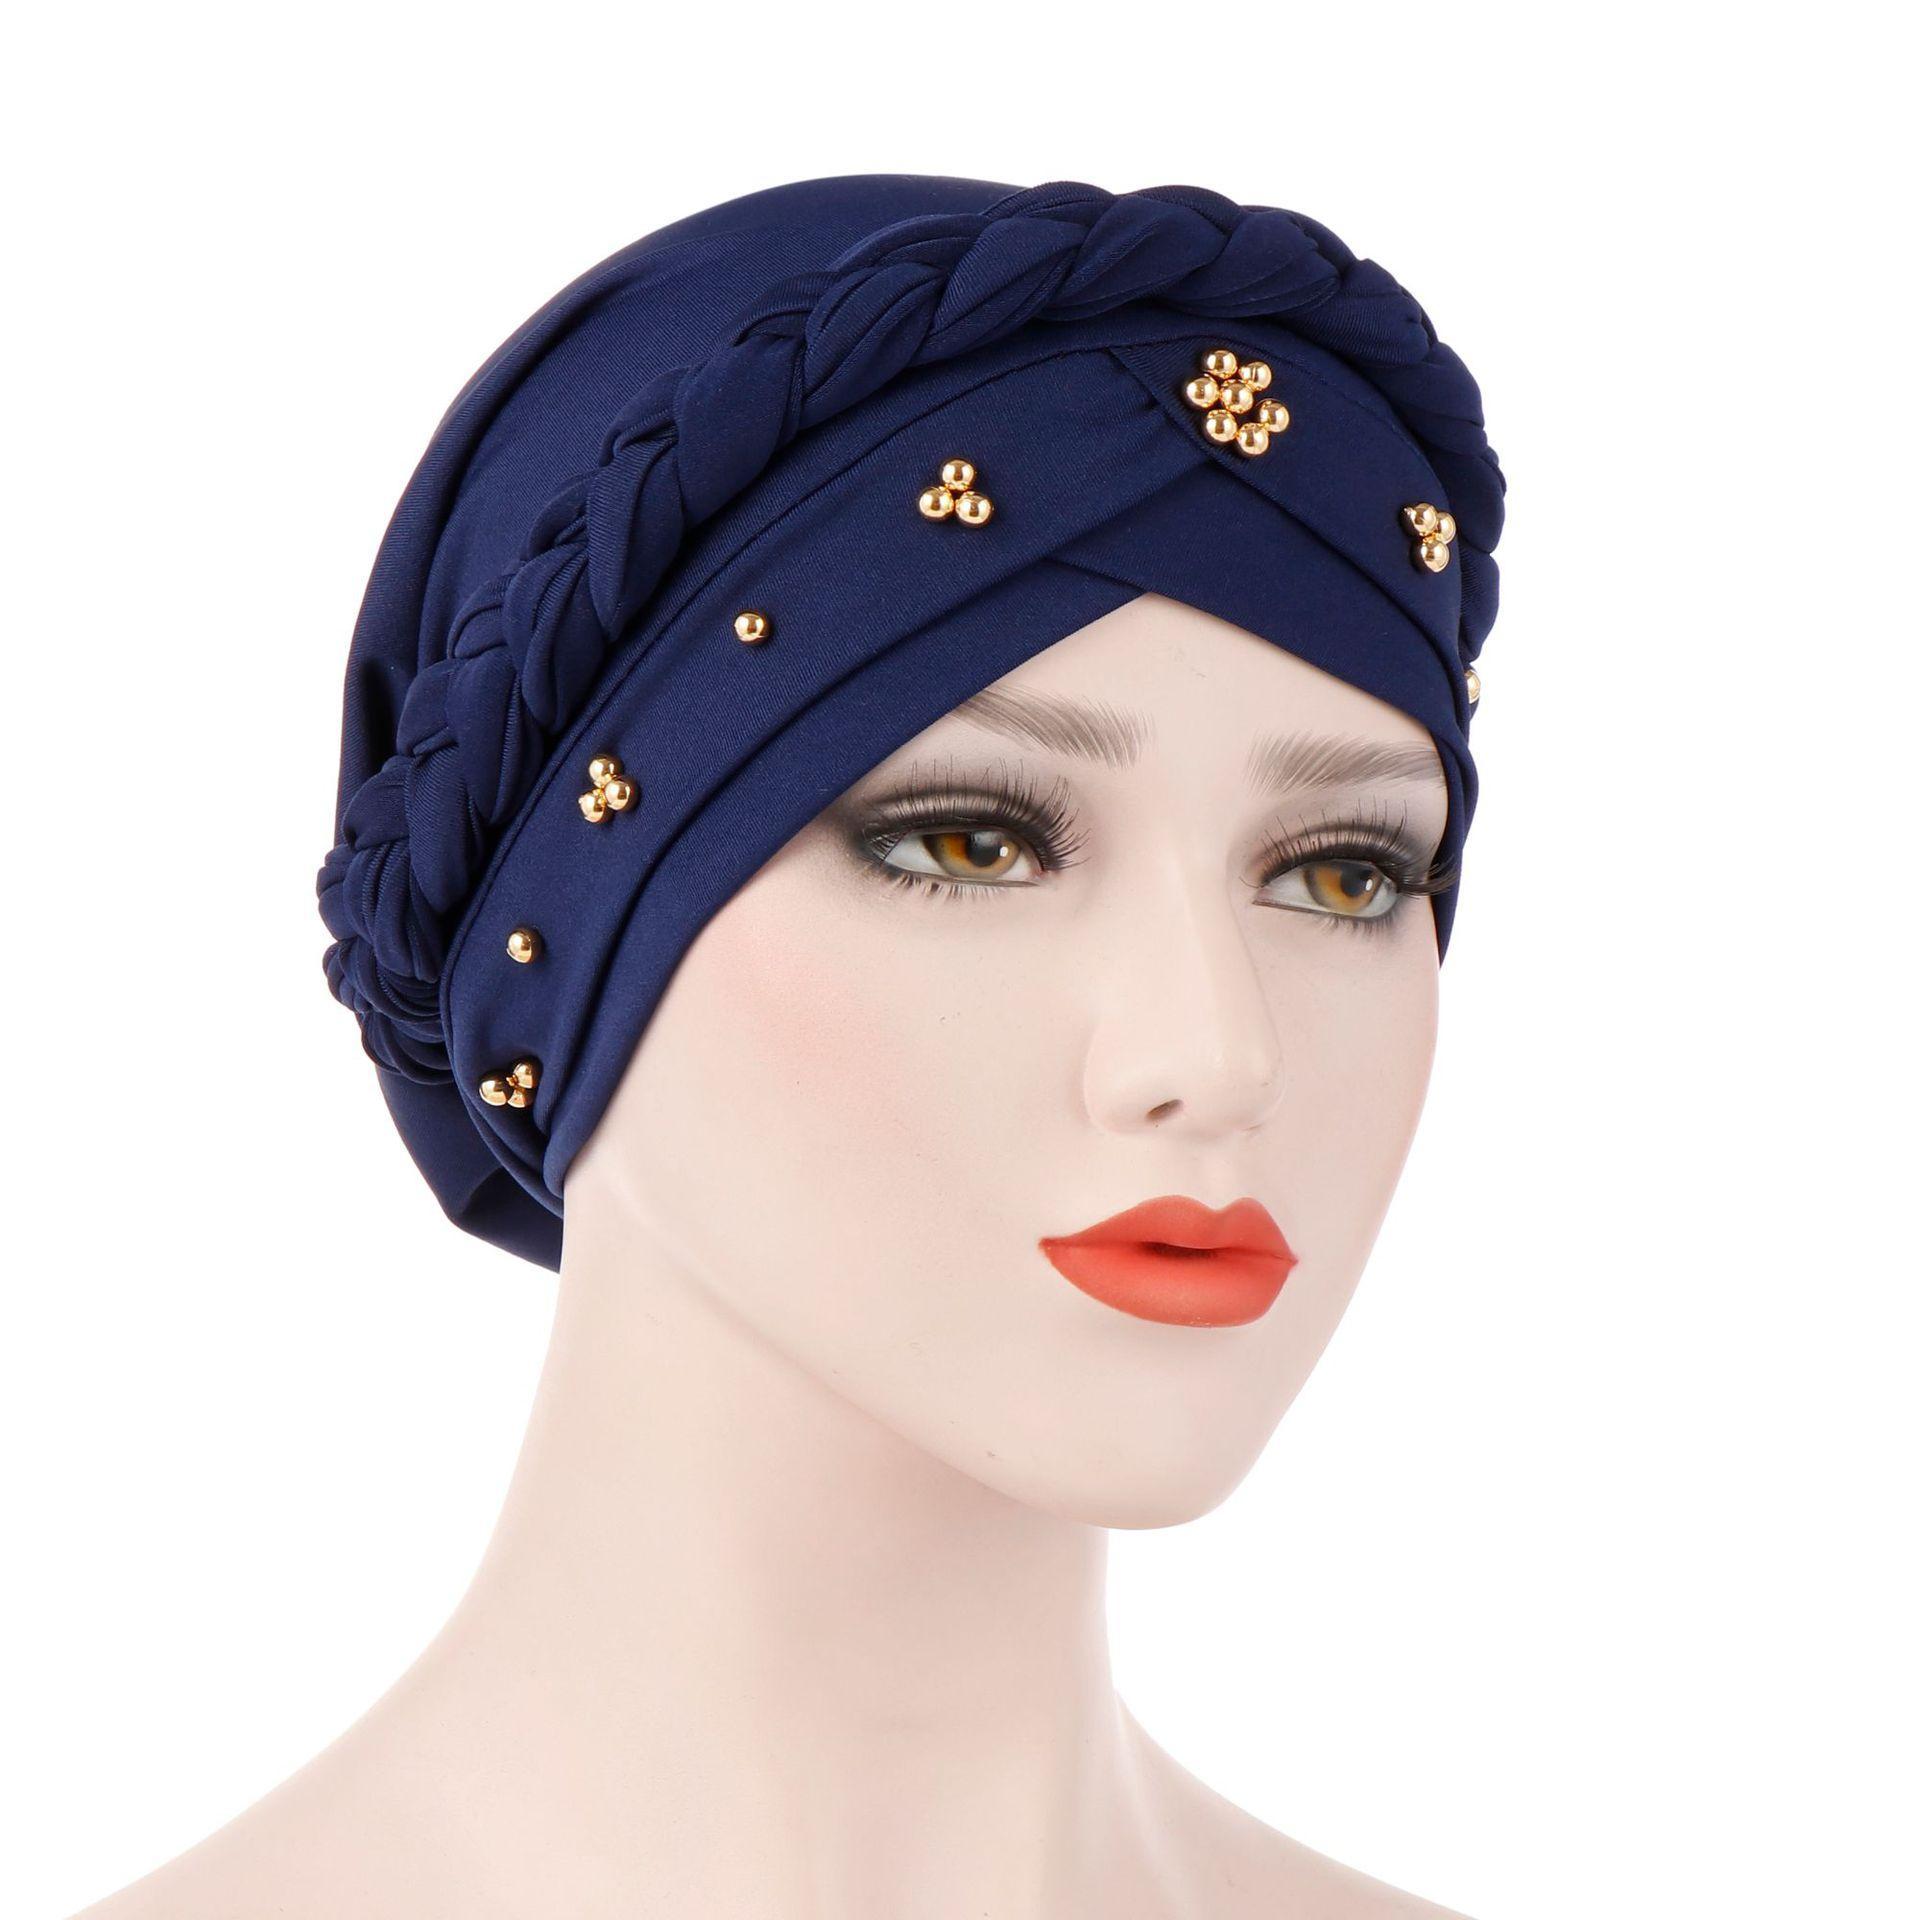 Muslim Turban Stretch Hat Braid Hijab Cap Head Wrap Hair Loss Head Scarf Milk Silk Beads Women Fashion Accessories